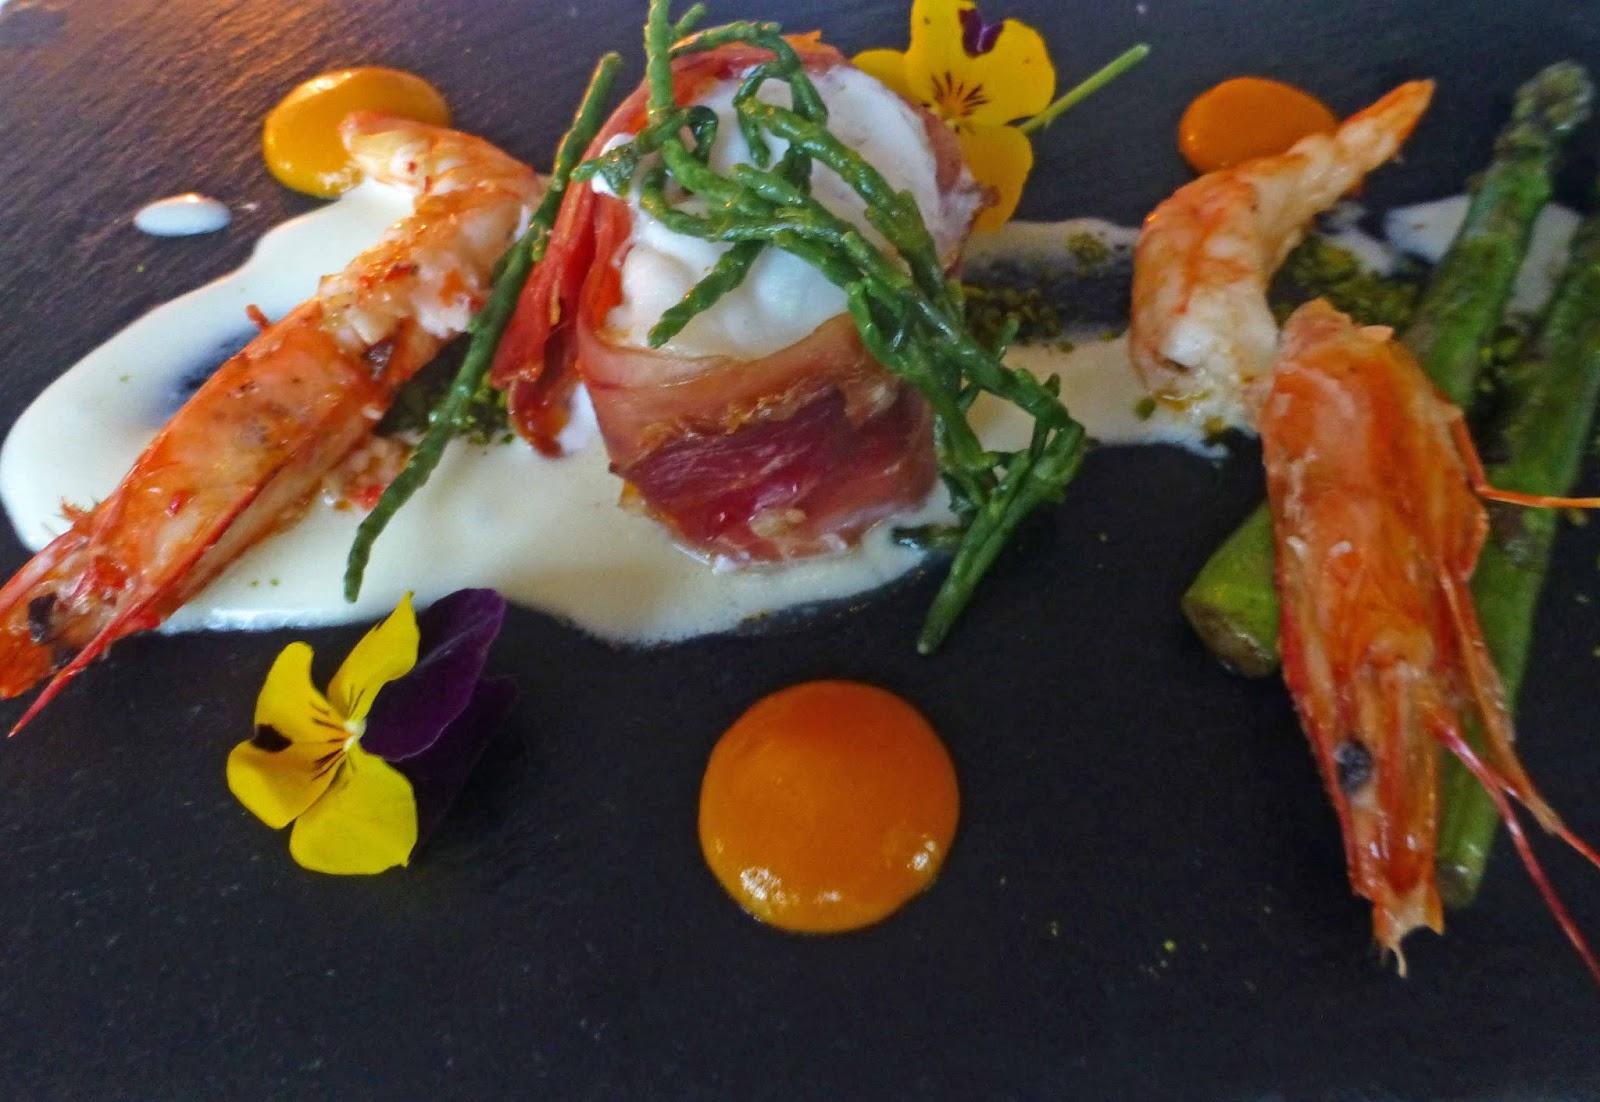 RESTAURANTS AND FOOD: Spain